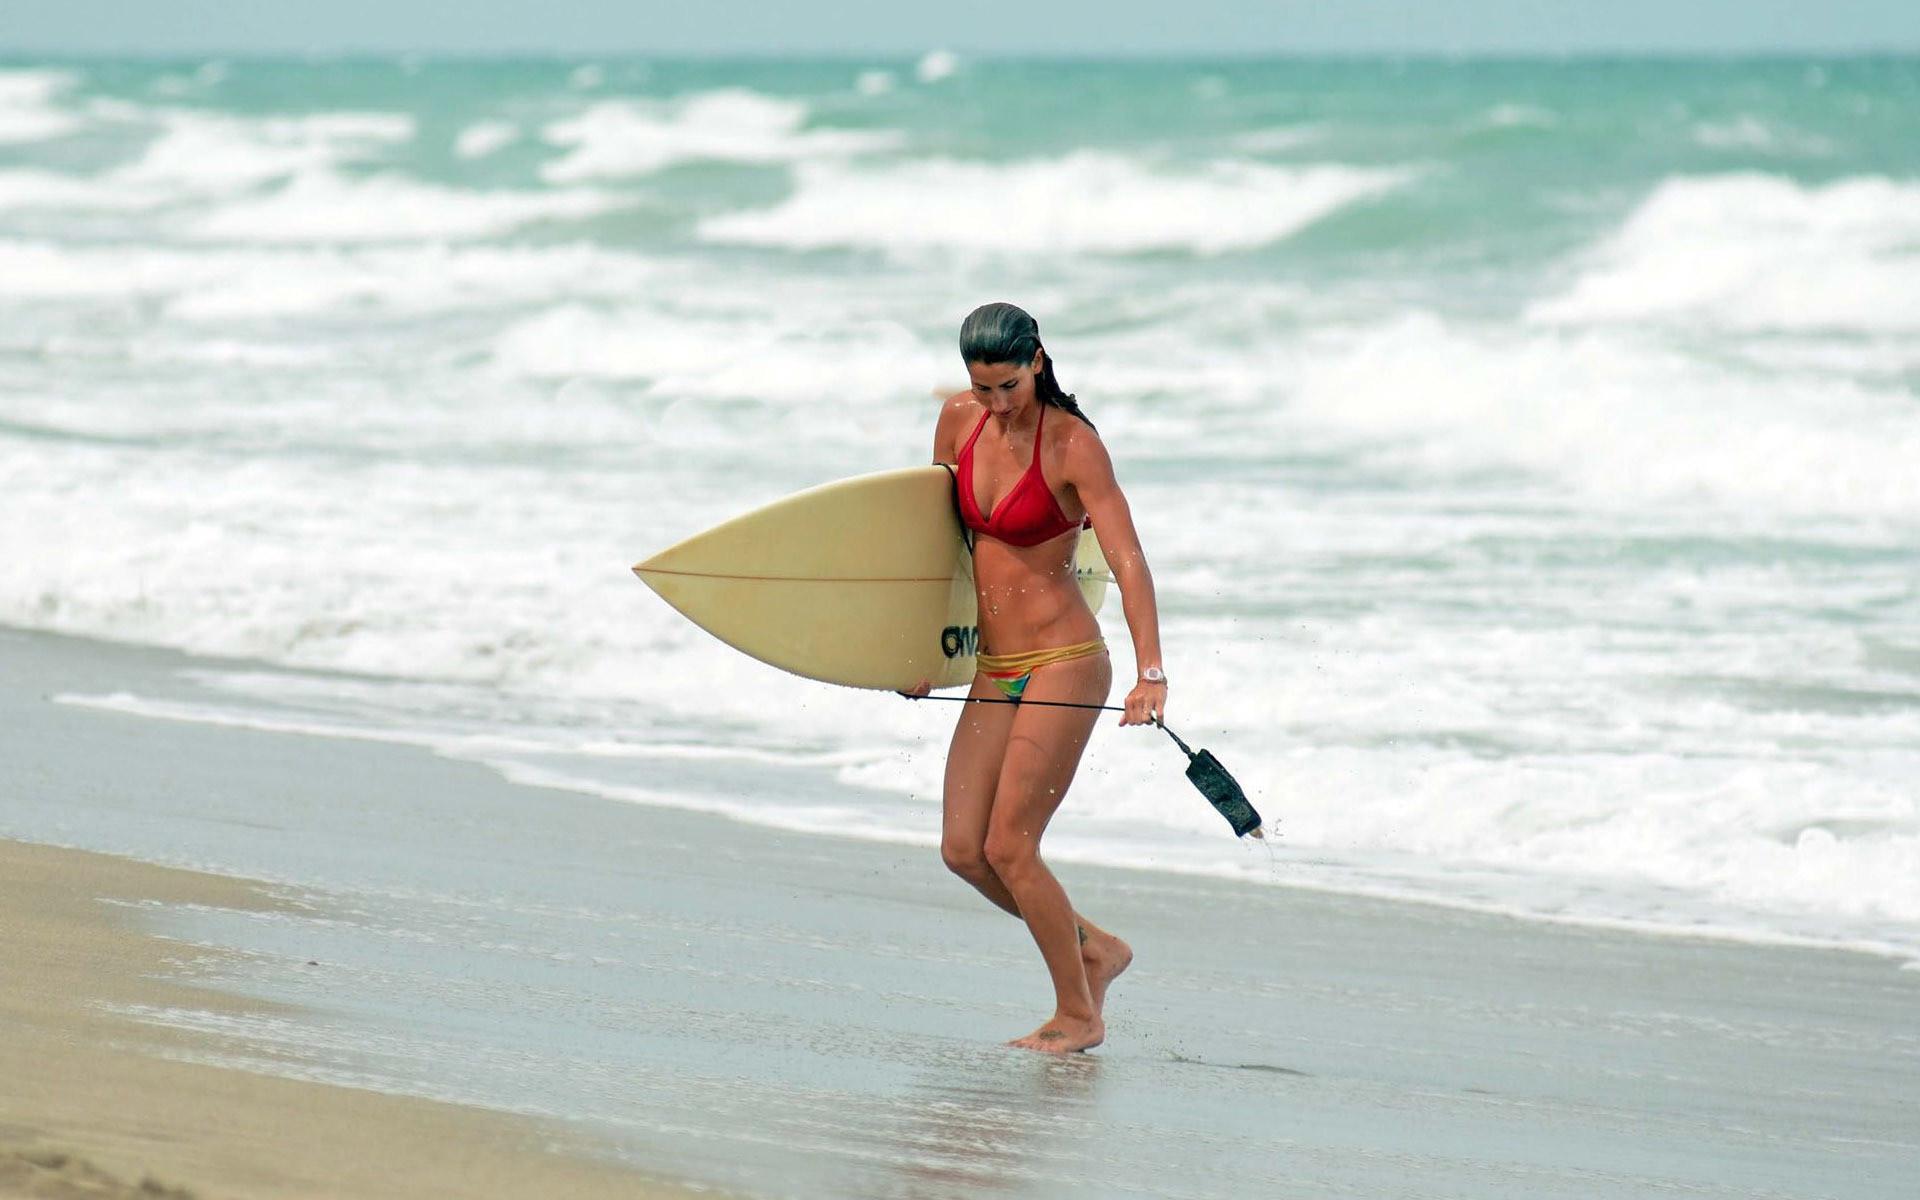 Surfer girl HD Wallpaper 1920×1080 Surfer girl HD Wallpaper 1920×1200